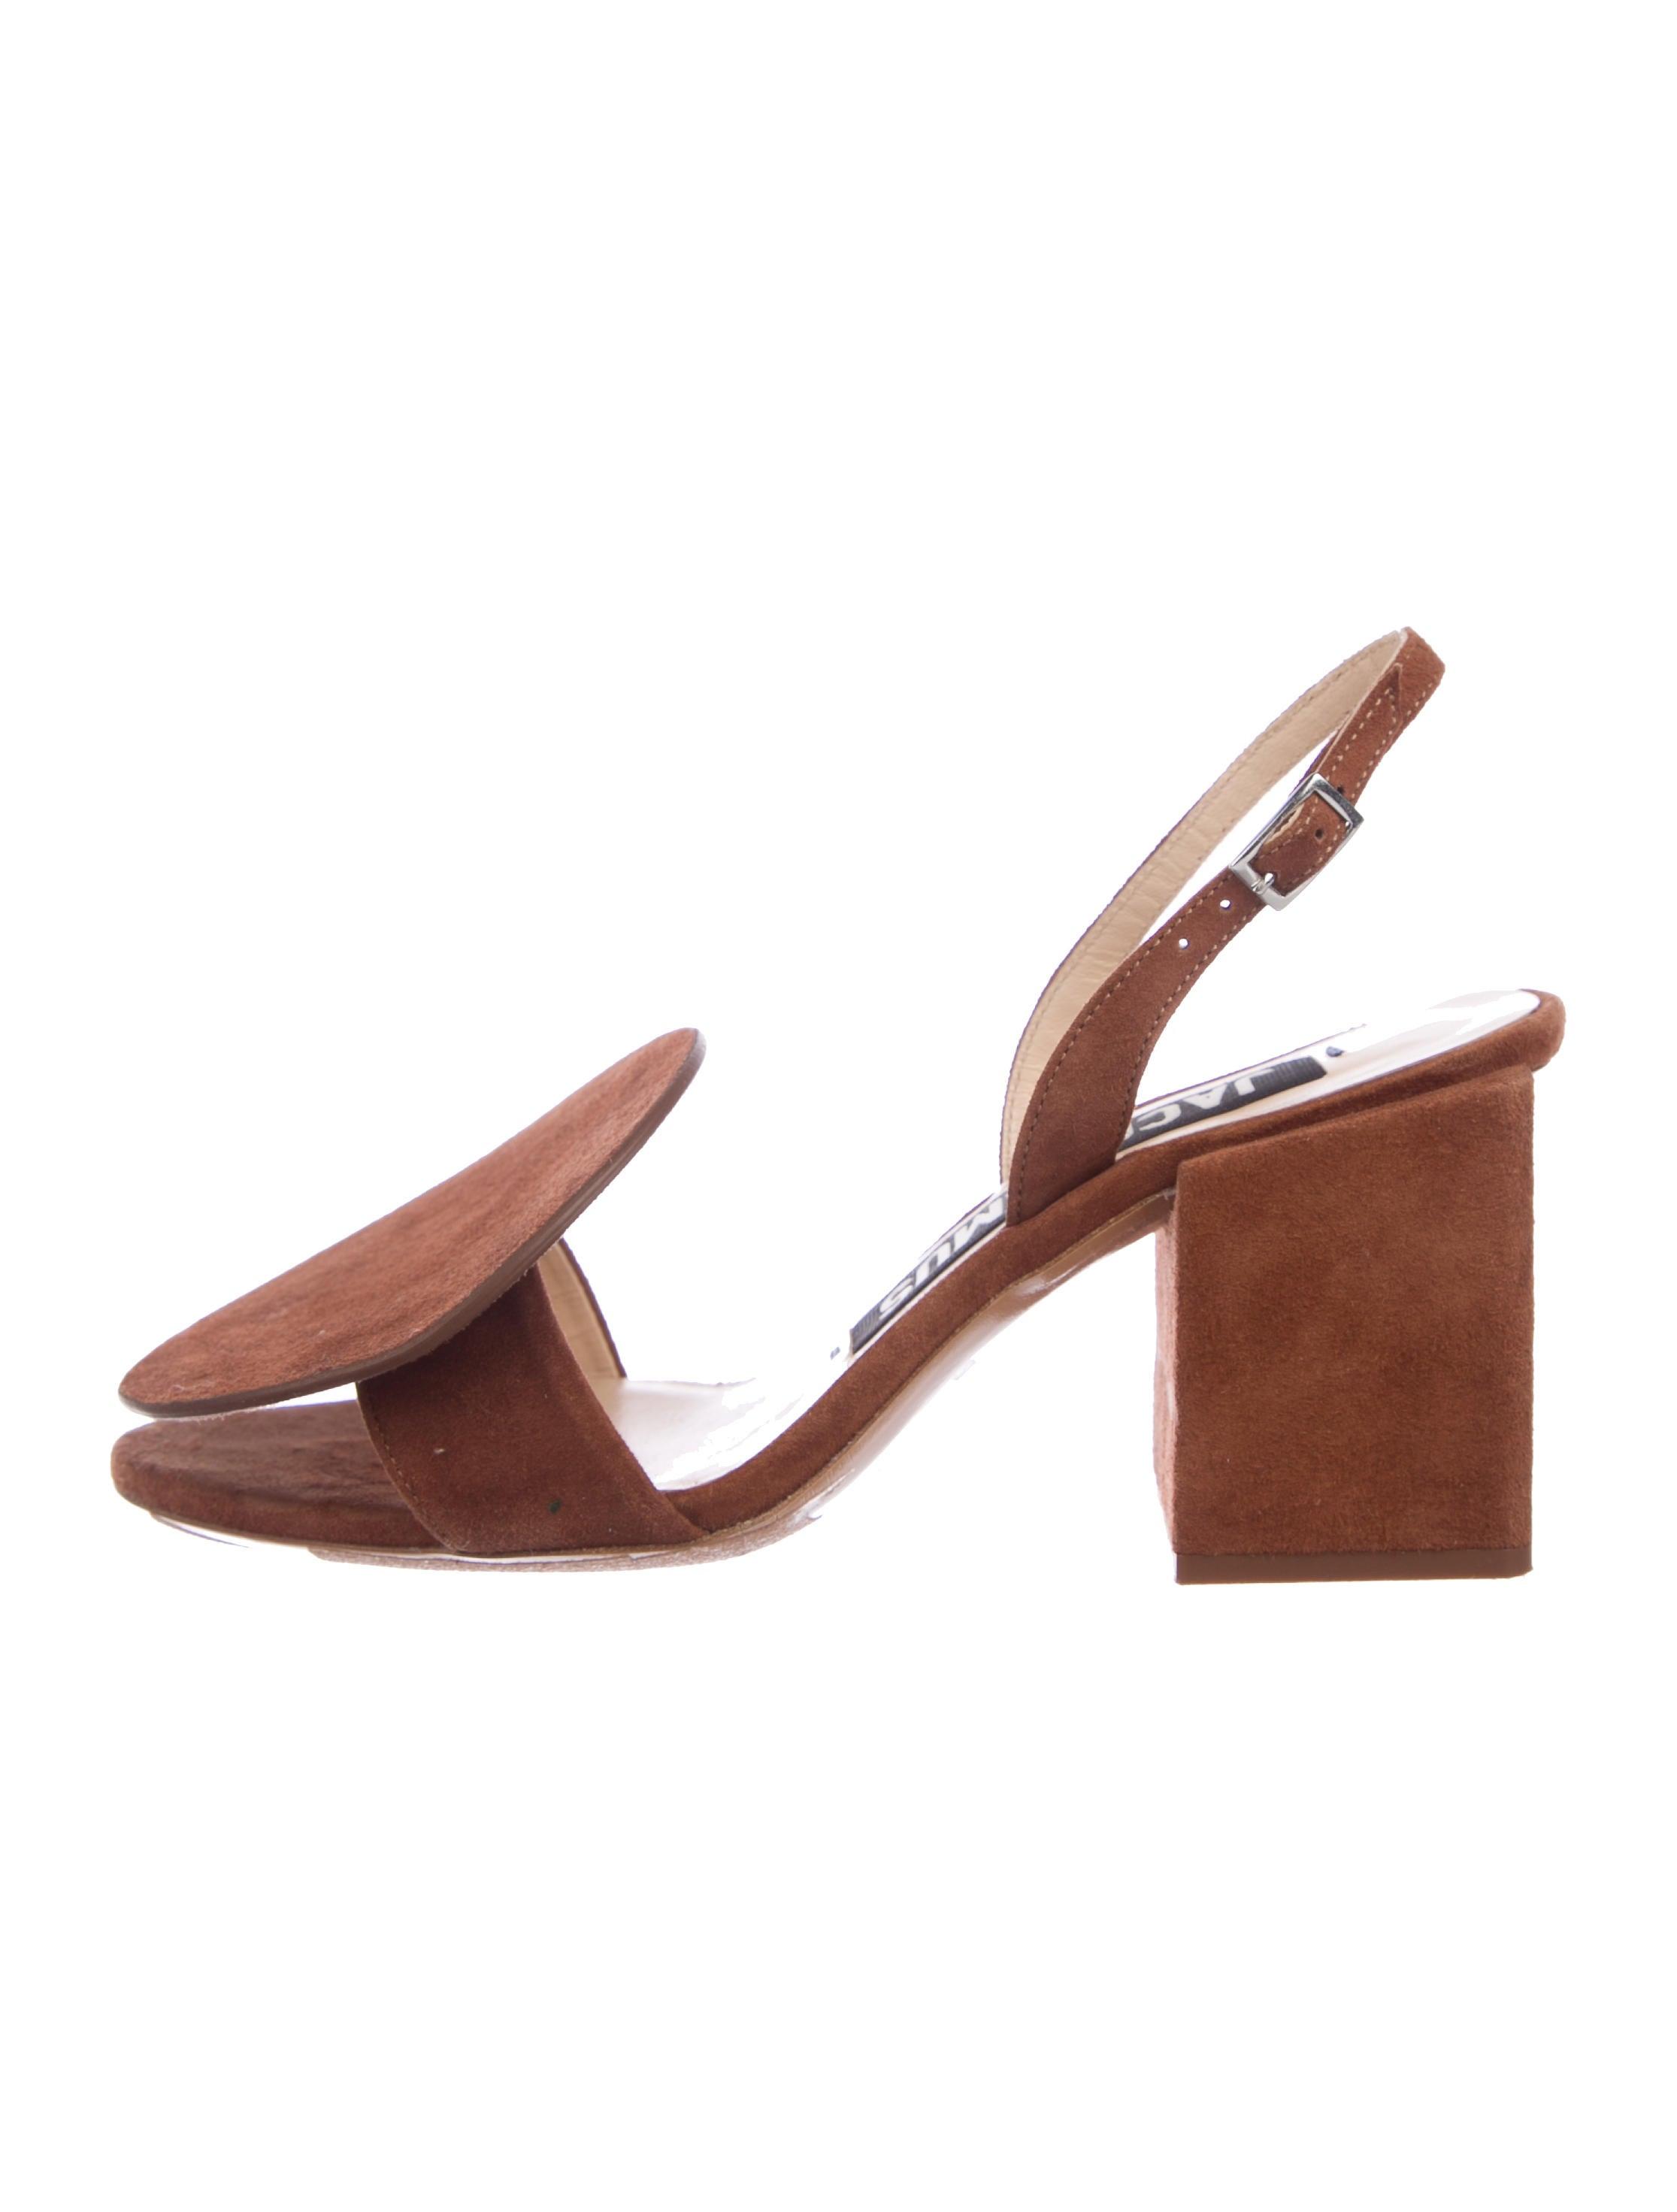 fb815b54886 Jacquemus Suede Slingback Sandals - Shoes - WJQ21008